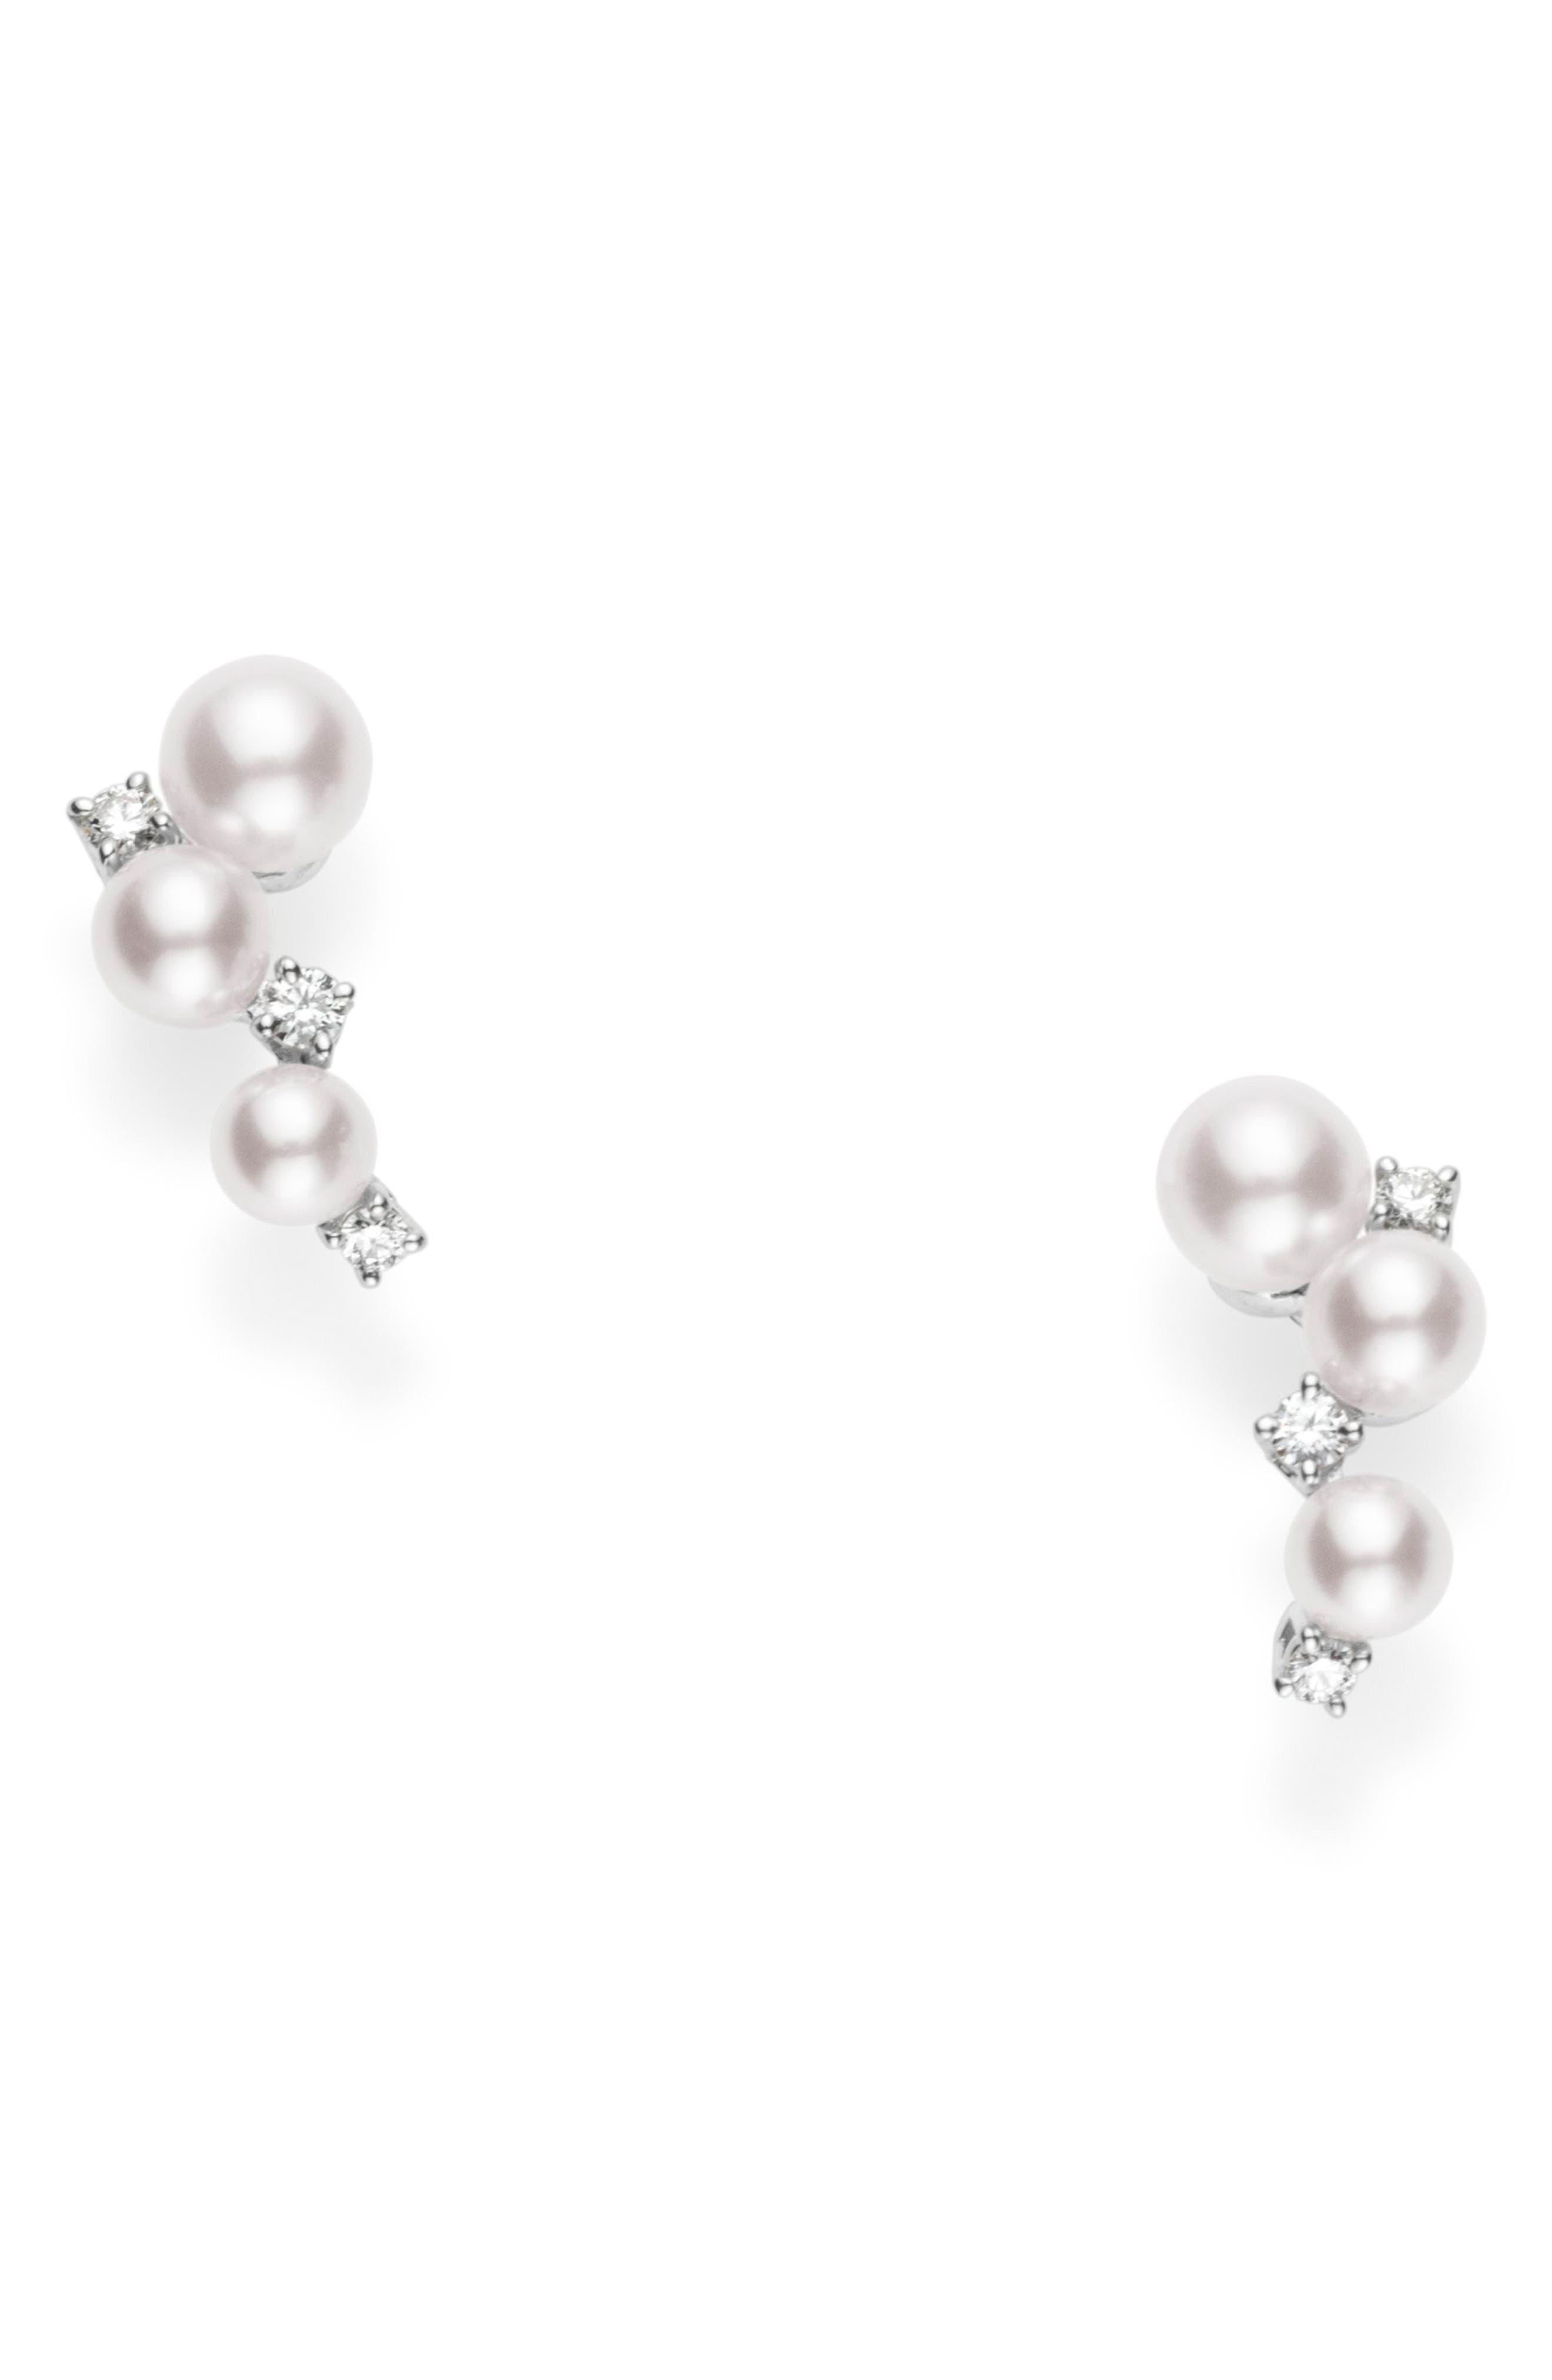 Pearl & Diamond Cluster Earrings,                             Main thumbnail 1, color,                             White Gold